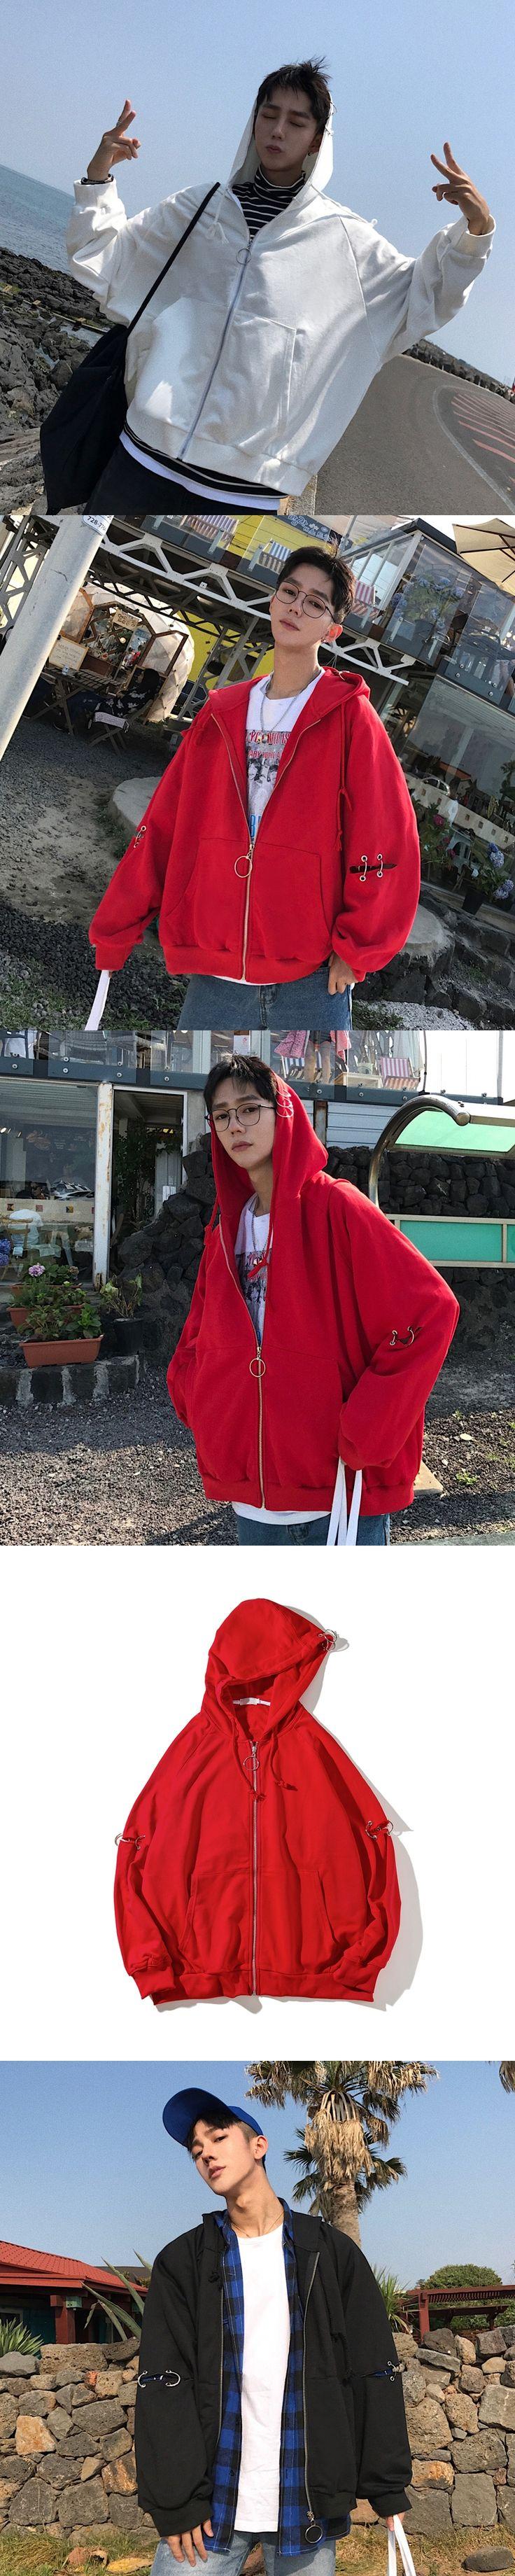 2017 Brand Autumn And Winter Leisure Tide Male Cardigan hoodies men sweatshirt tracksuit hooded zipper Casual Tops New Hoody